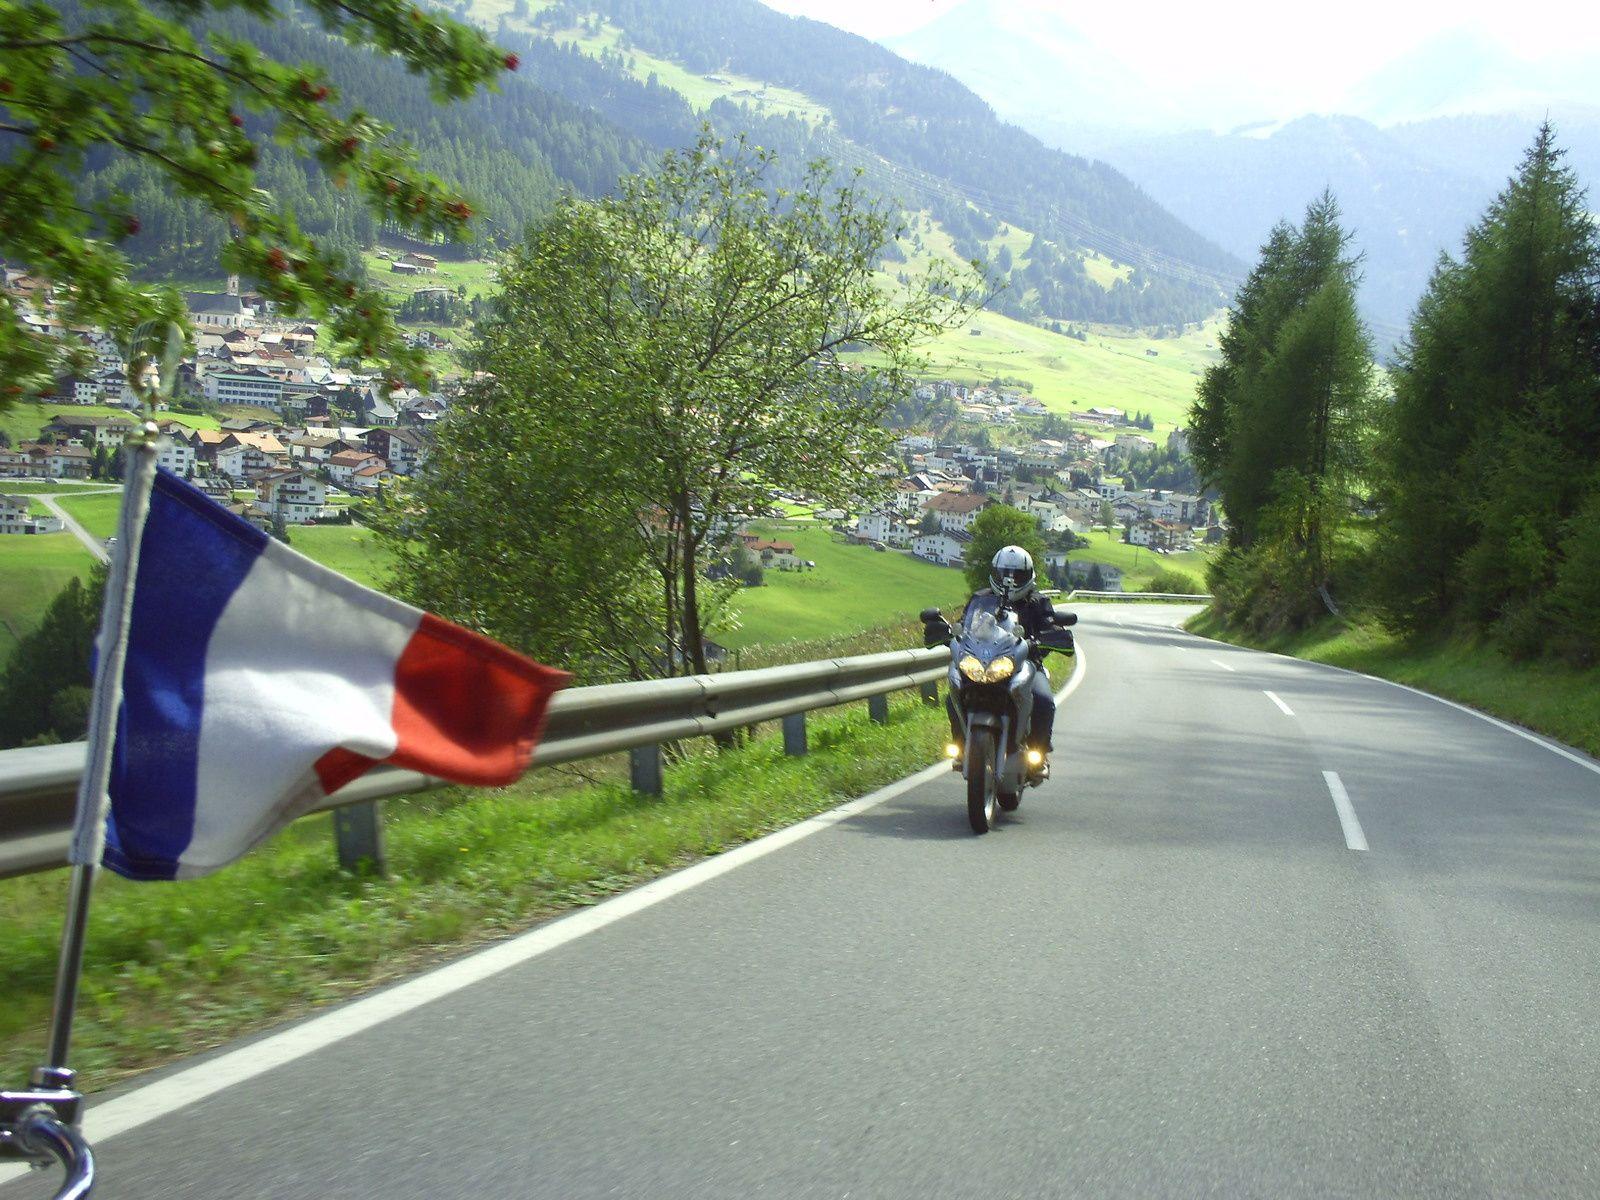 Goldwing - voyage au Tyrol en gold 1800 et varadero 125 5/6